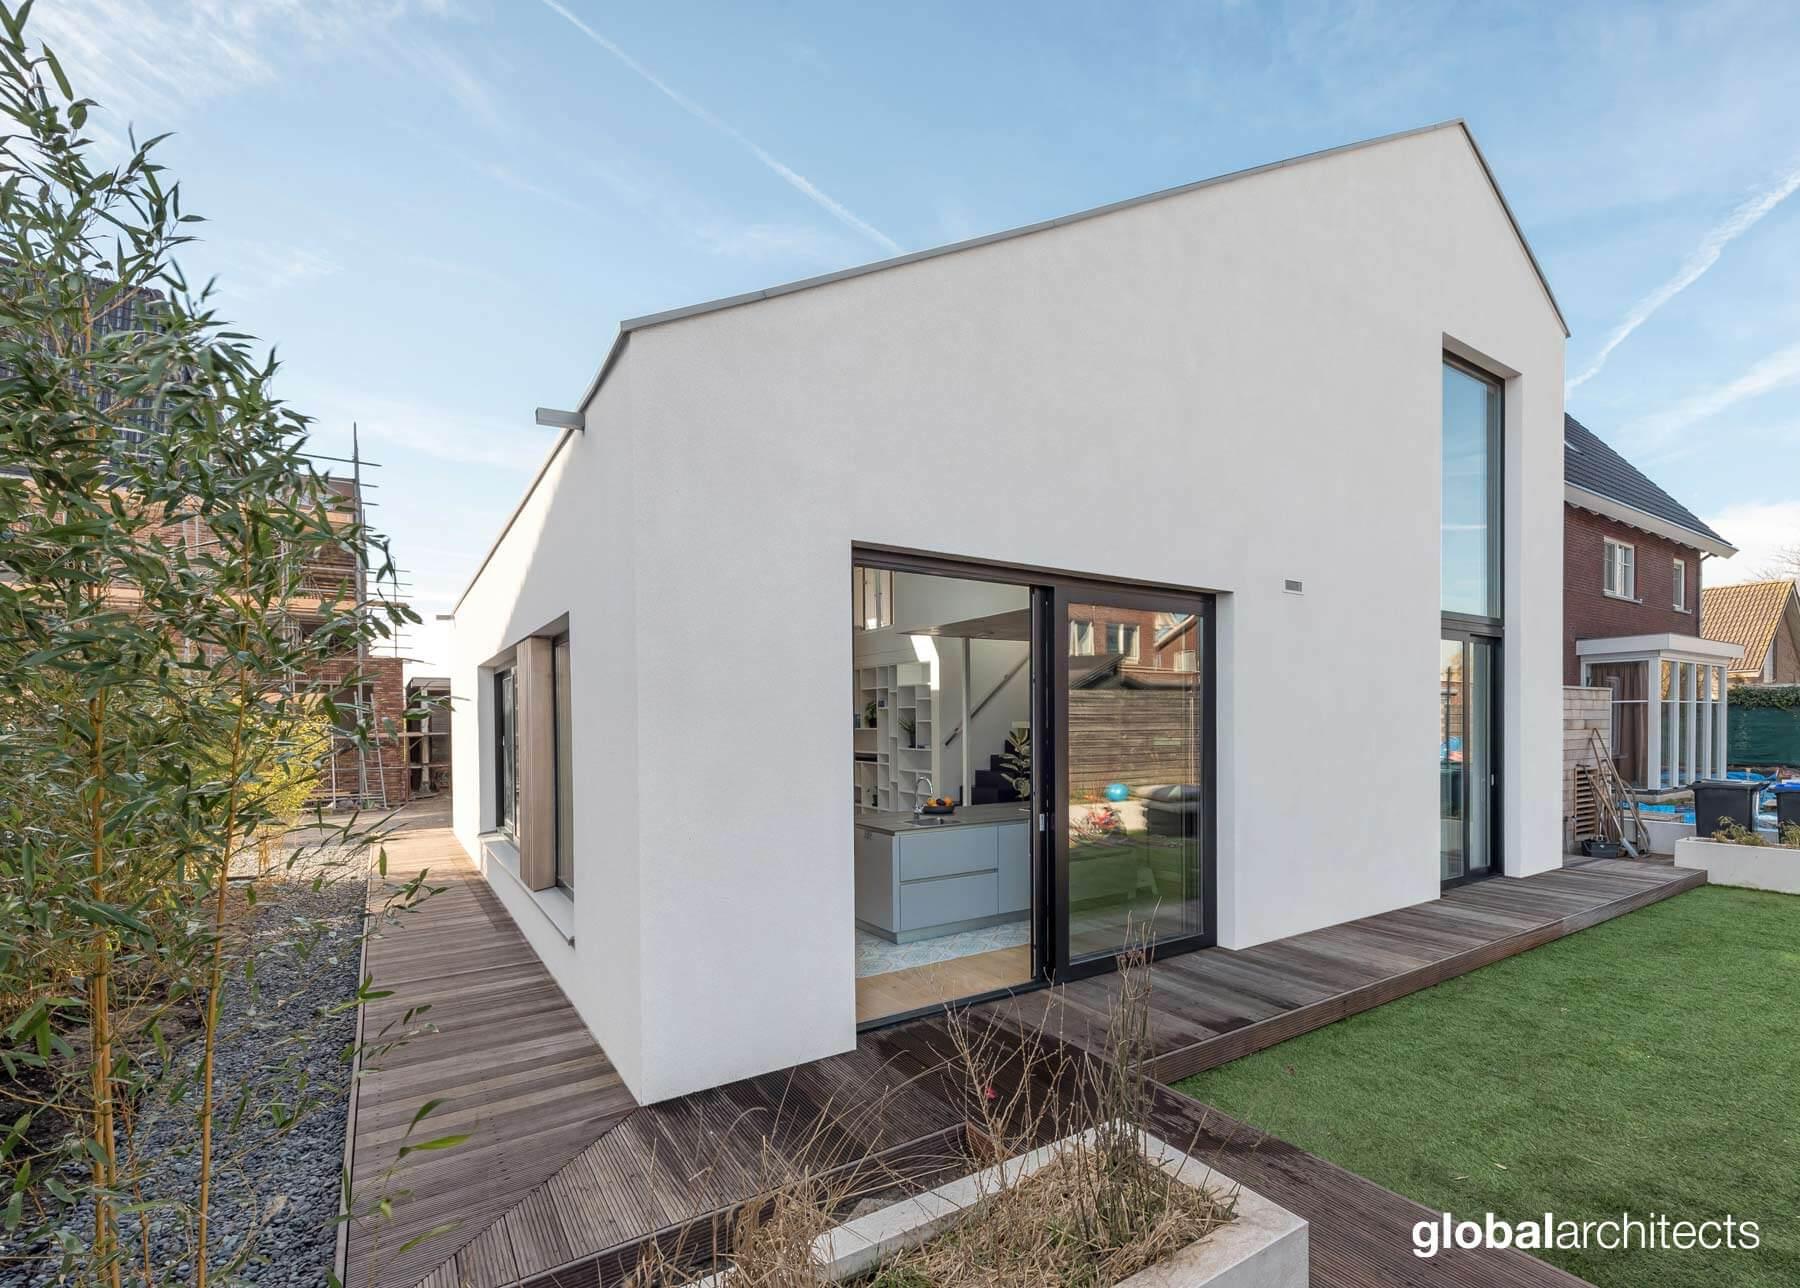 hidden-village-villa-zelfbouw-architectenbureau-den-haag-amsterdam-tuinontwerp